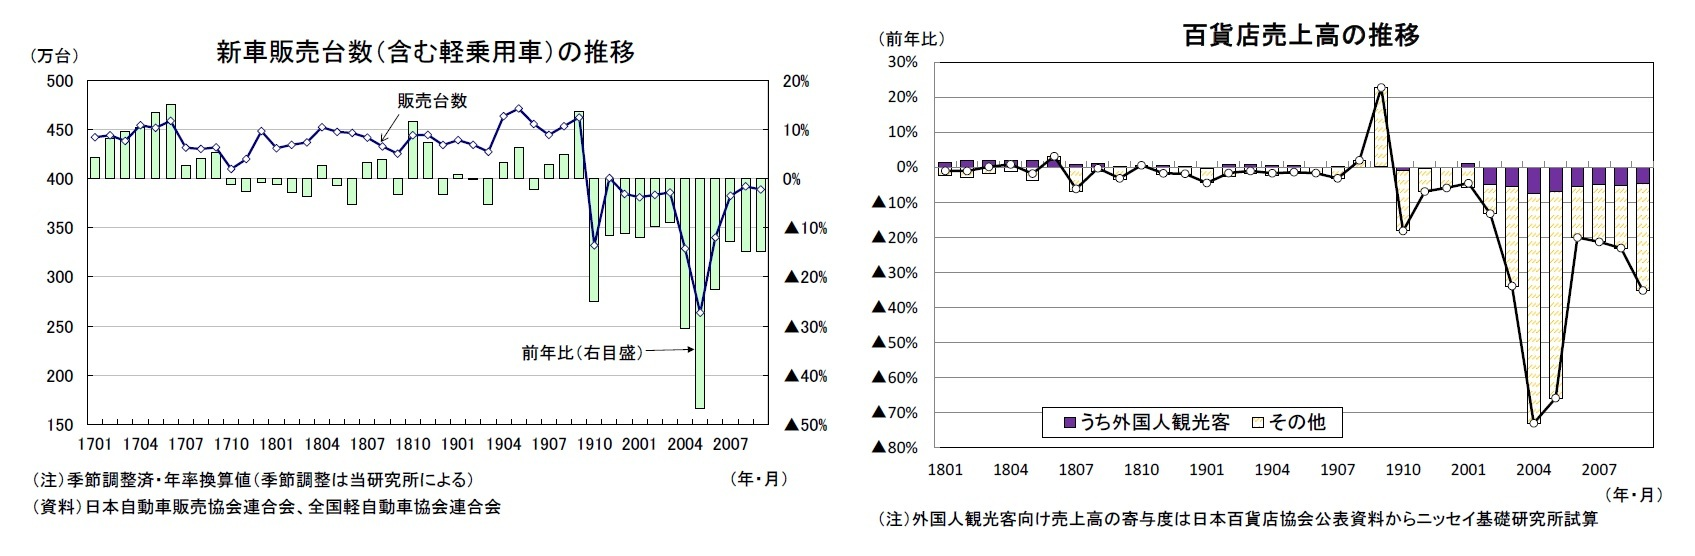 新車販売台数(含む軽乗用車)の推移/百貨店売上高の推移